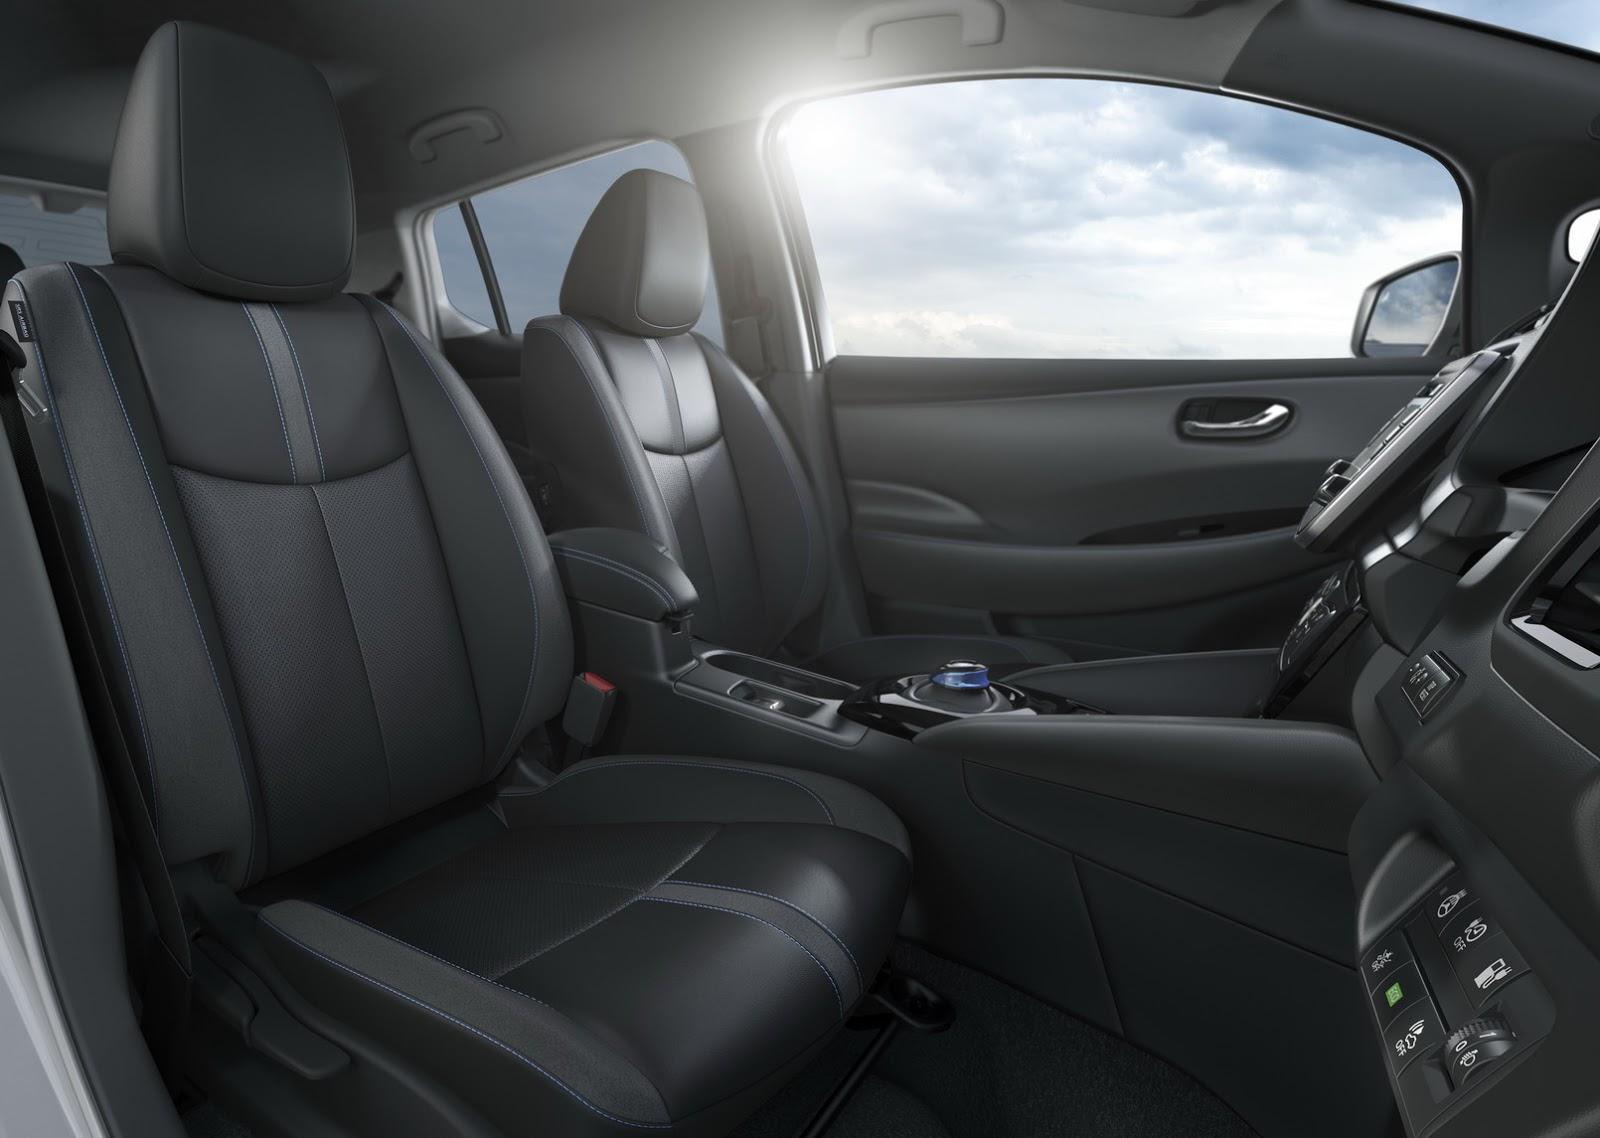 Nissan Leaf 2018 EU (27)